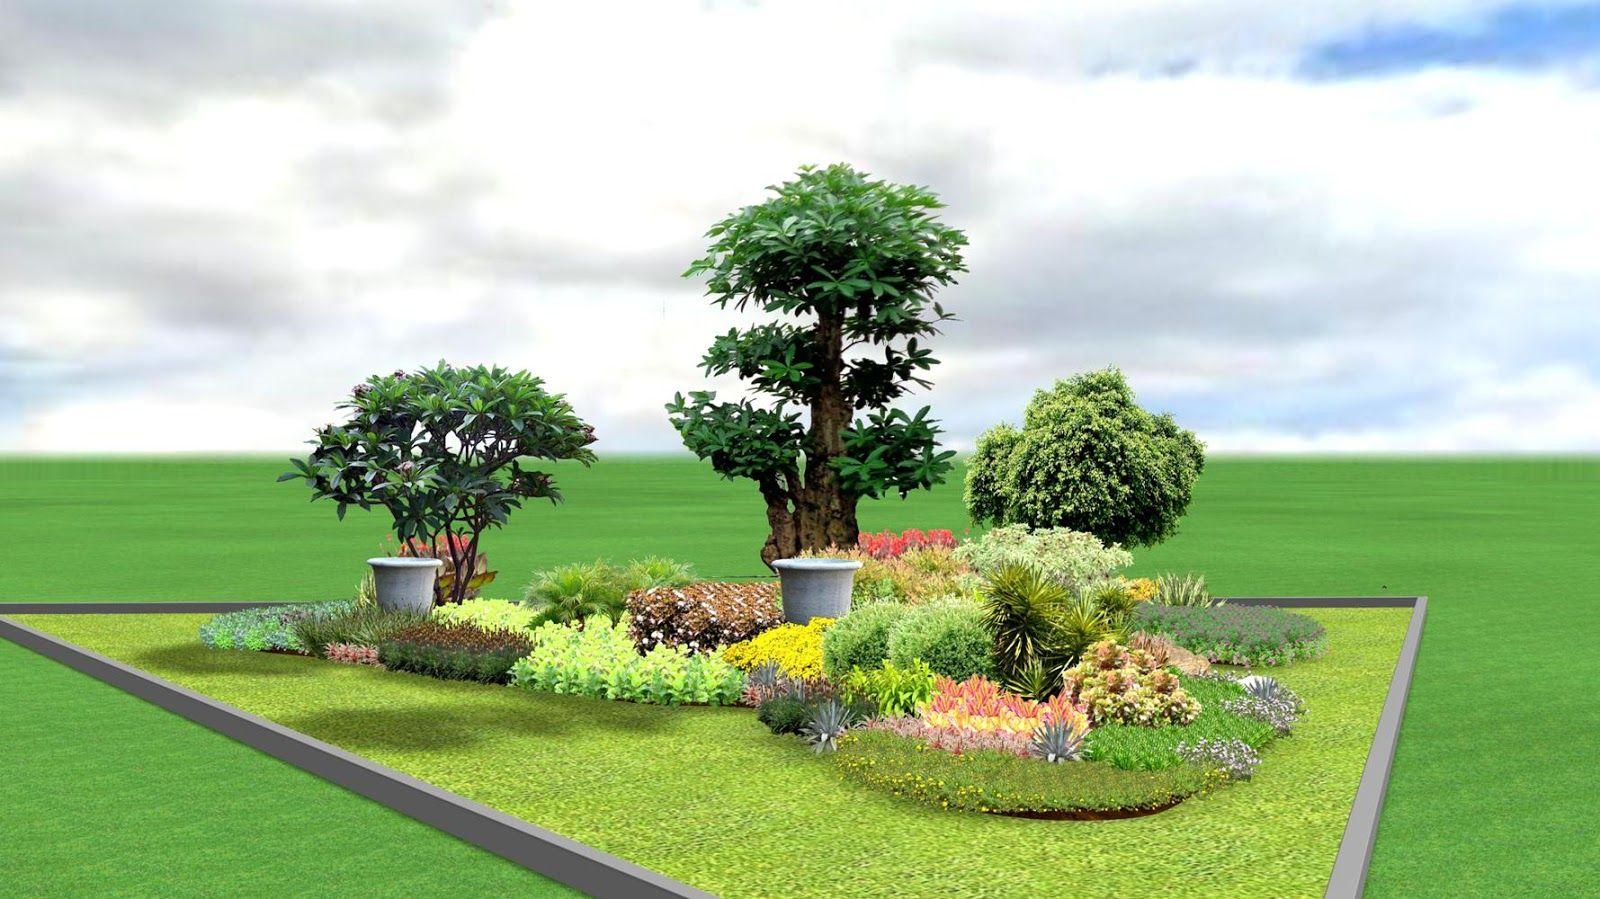 Tukang Taman Surabaya Desain Taman Surabaya Http Www Jasataman Co Id Kebun Kecil Taman Desain Taman